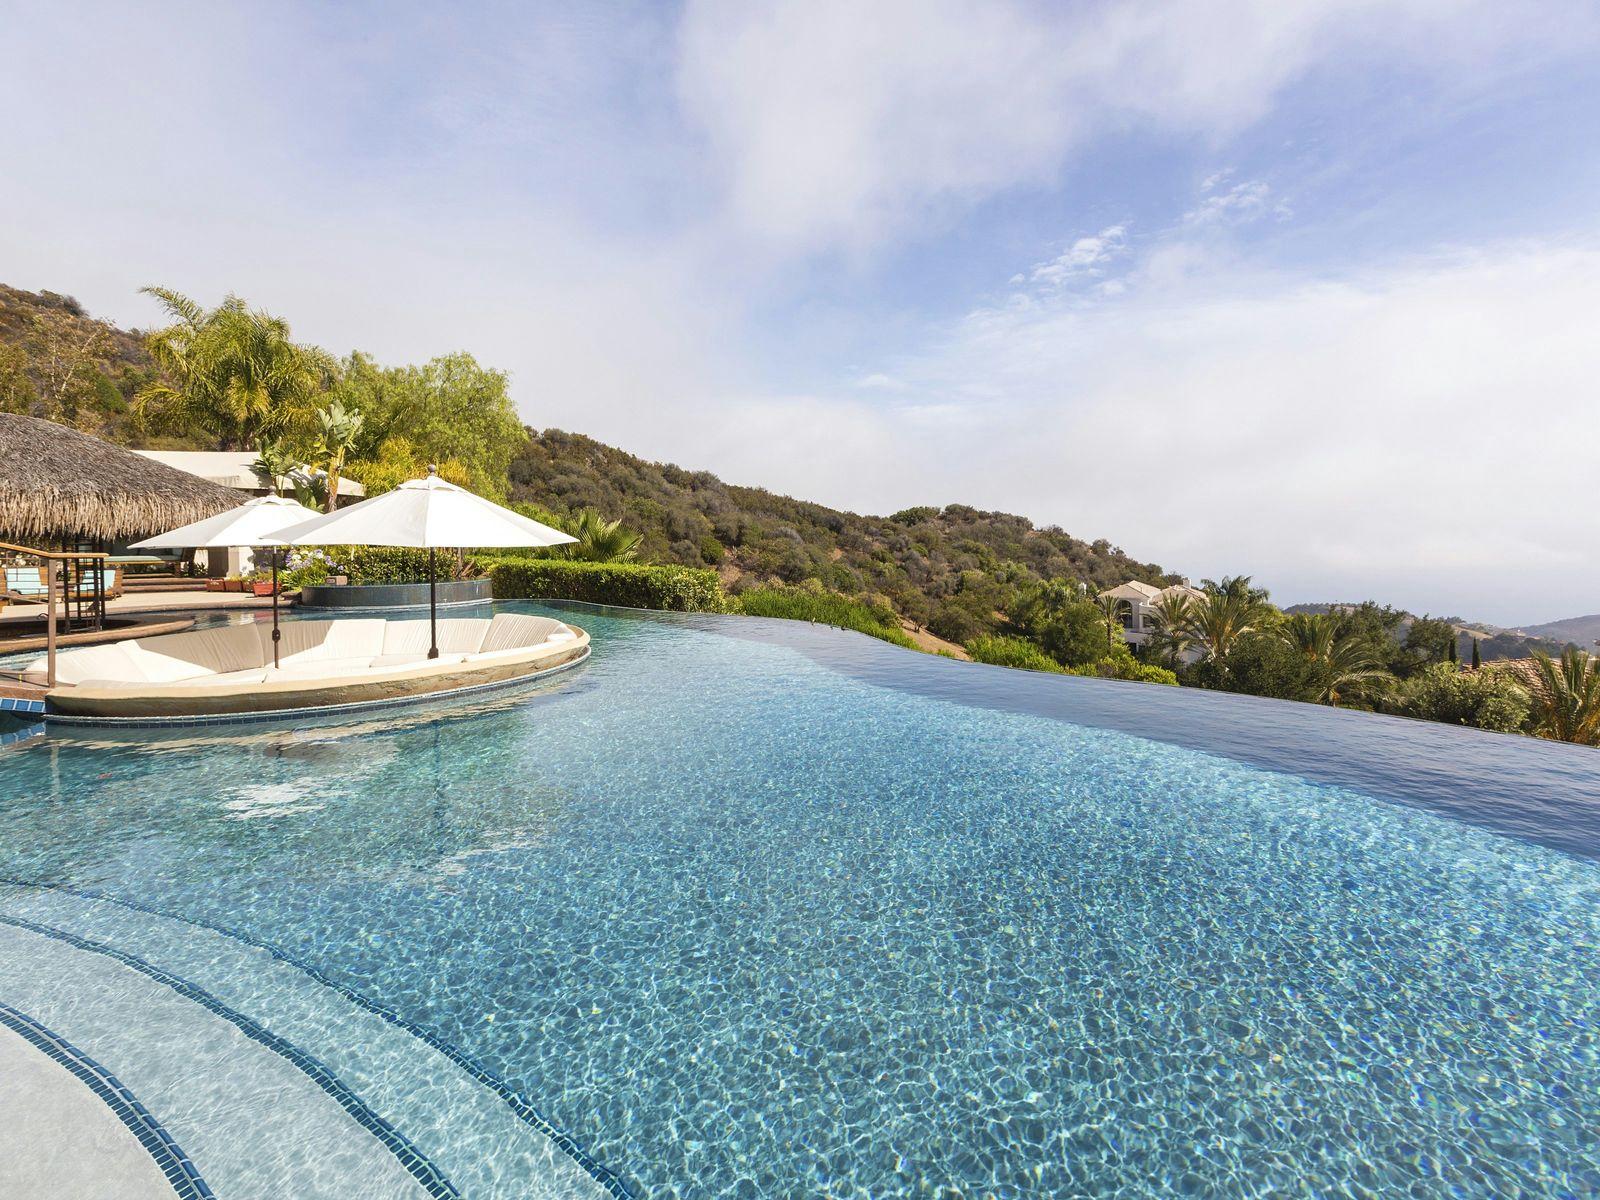 Ocean View Estate in Pacific Palisades